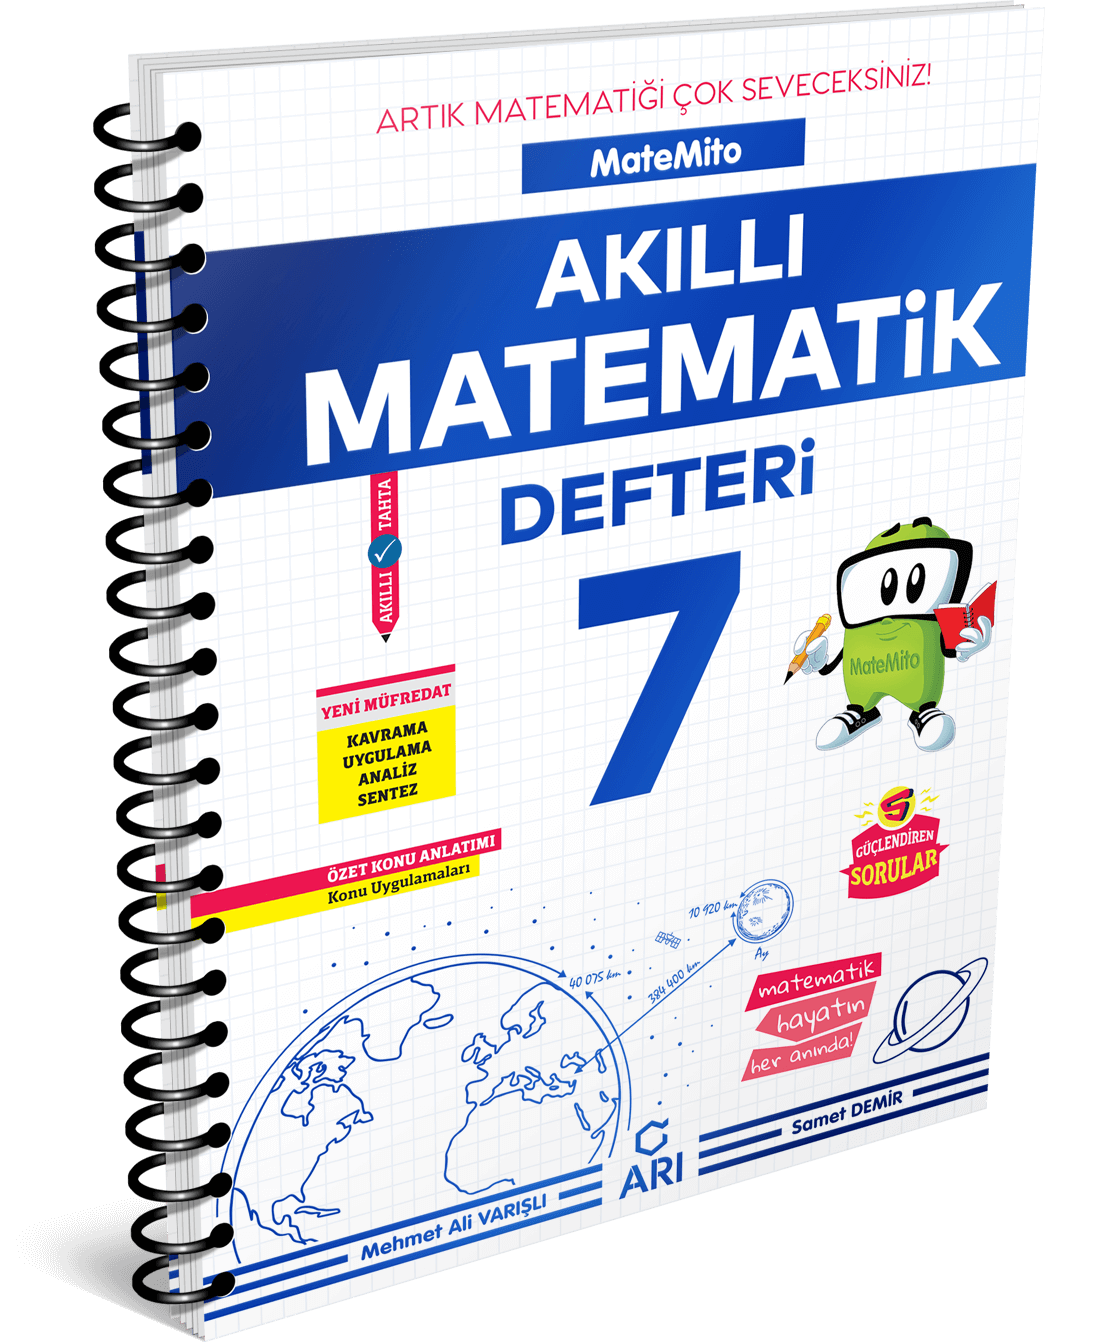 Matemito Akıllı Matematik Defteri 7. Sınıf